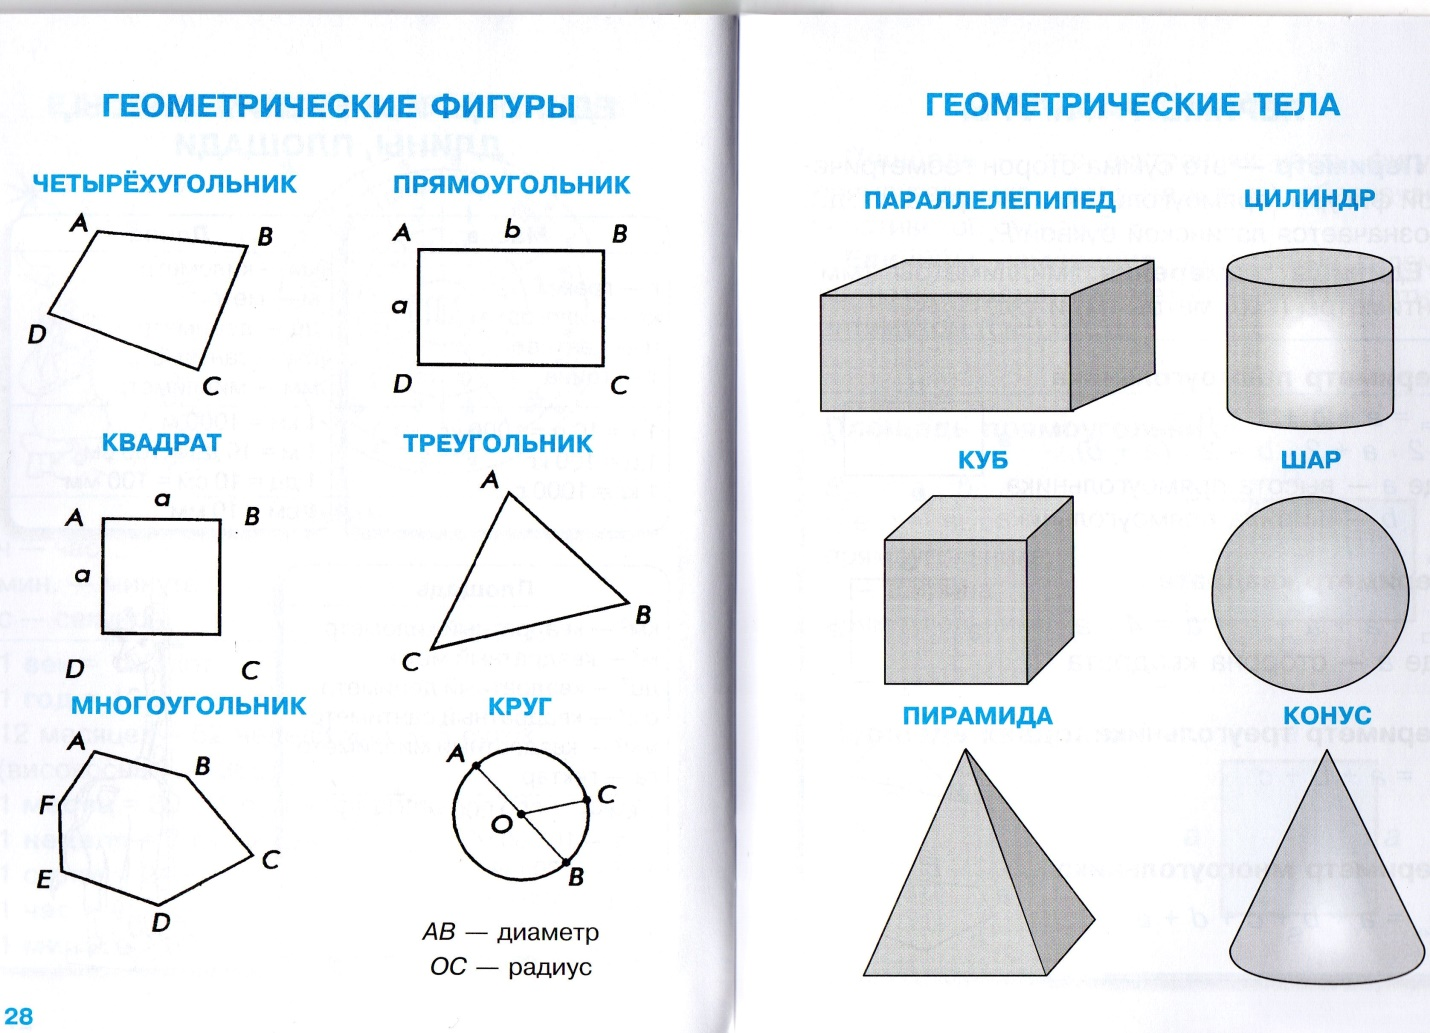 фото картинки всех фигур по геометрии ним стараются